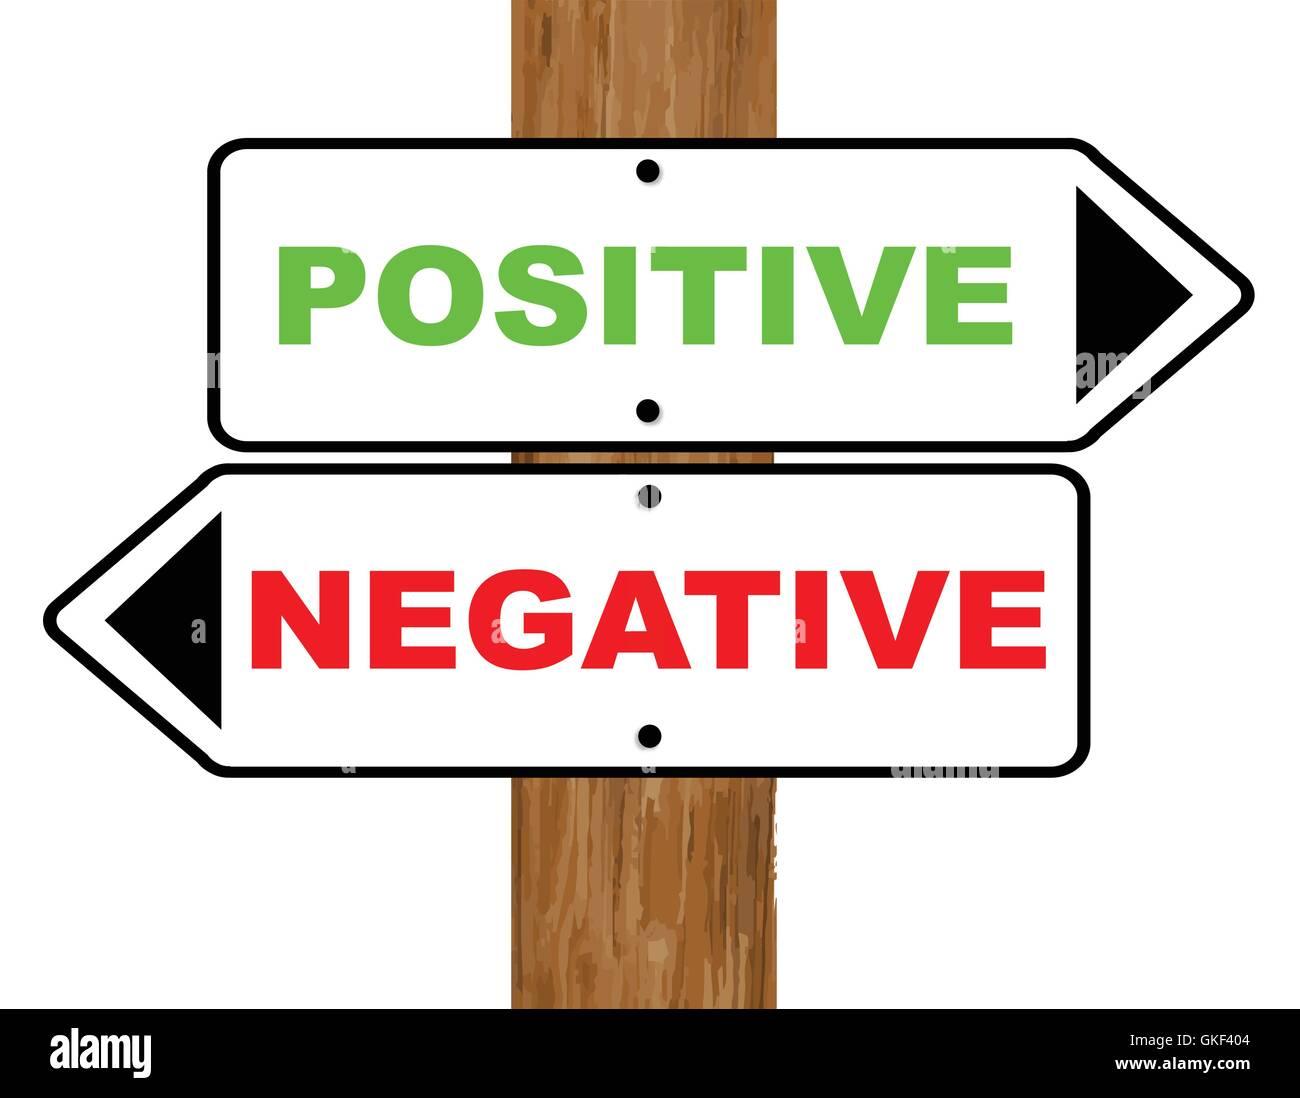 Positive Negative Stock Vector Image & Art - Alamy